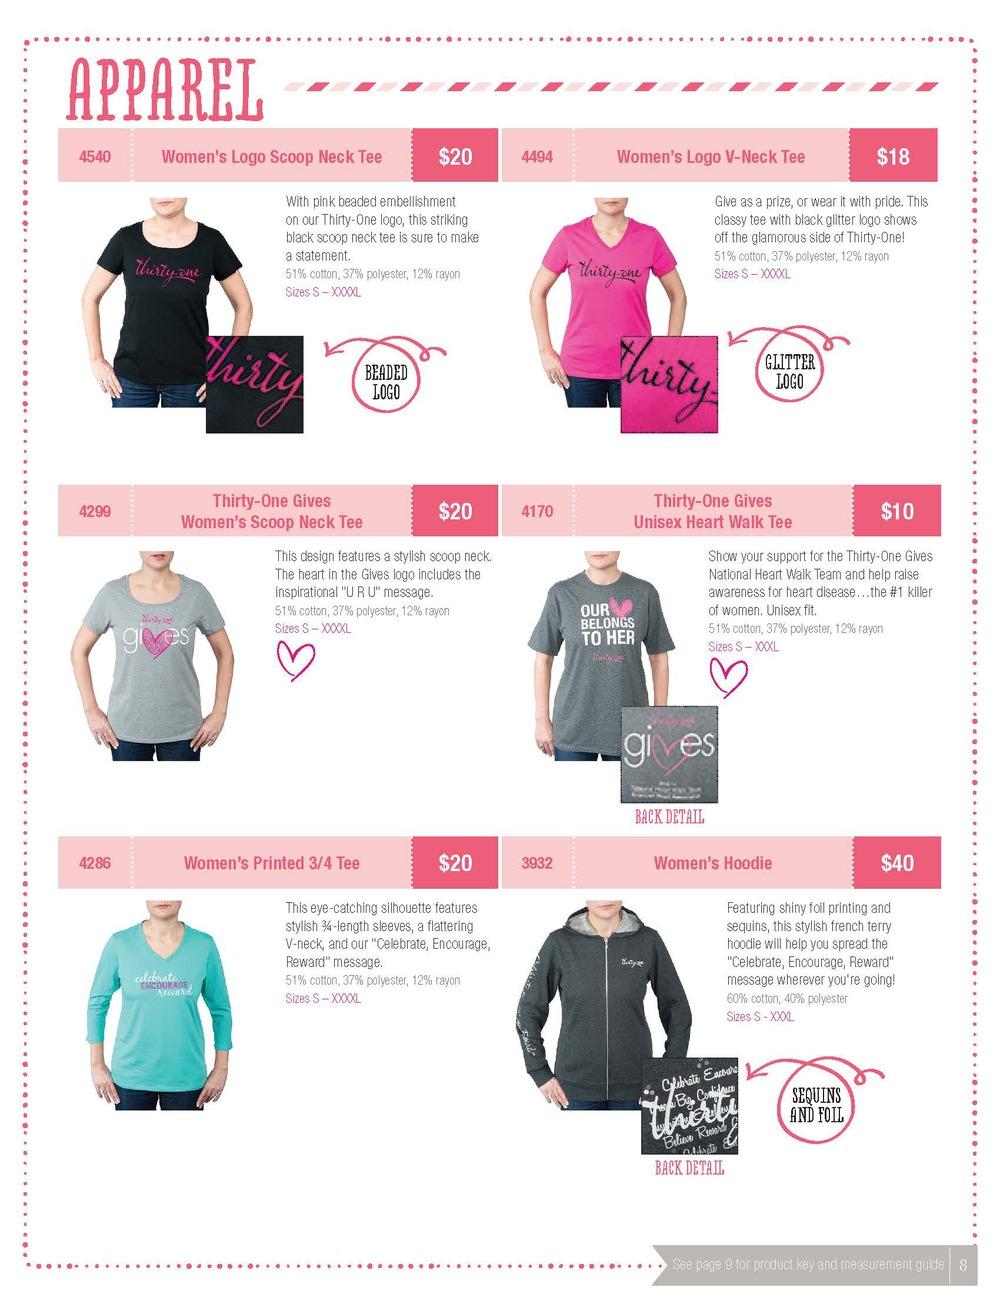 BS_14SU_ShoppingGuide_US_web_Page_8.jpg